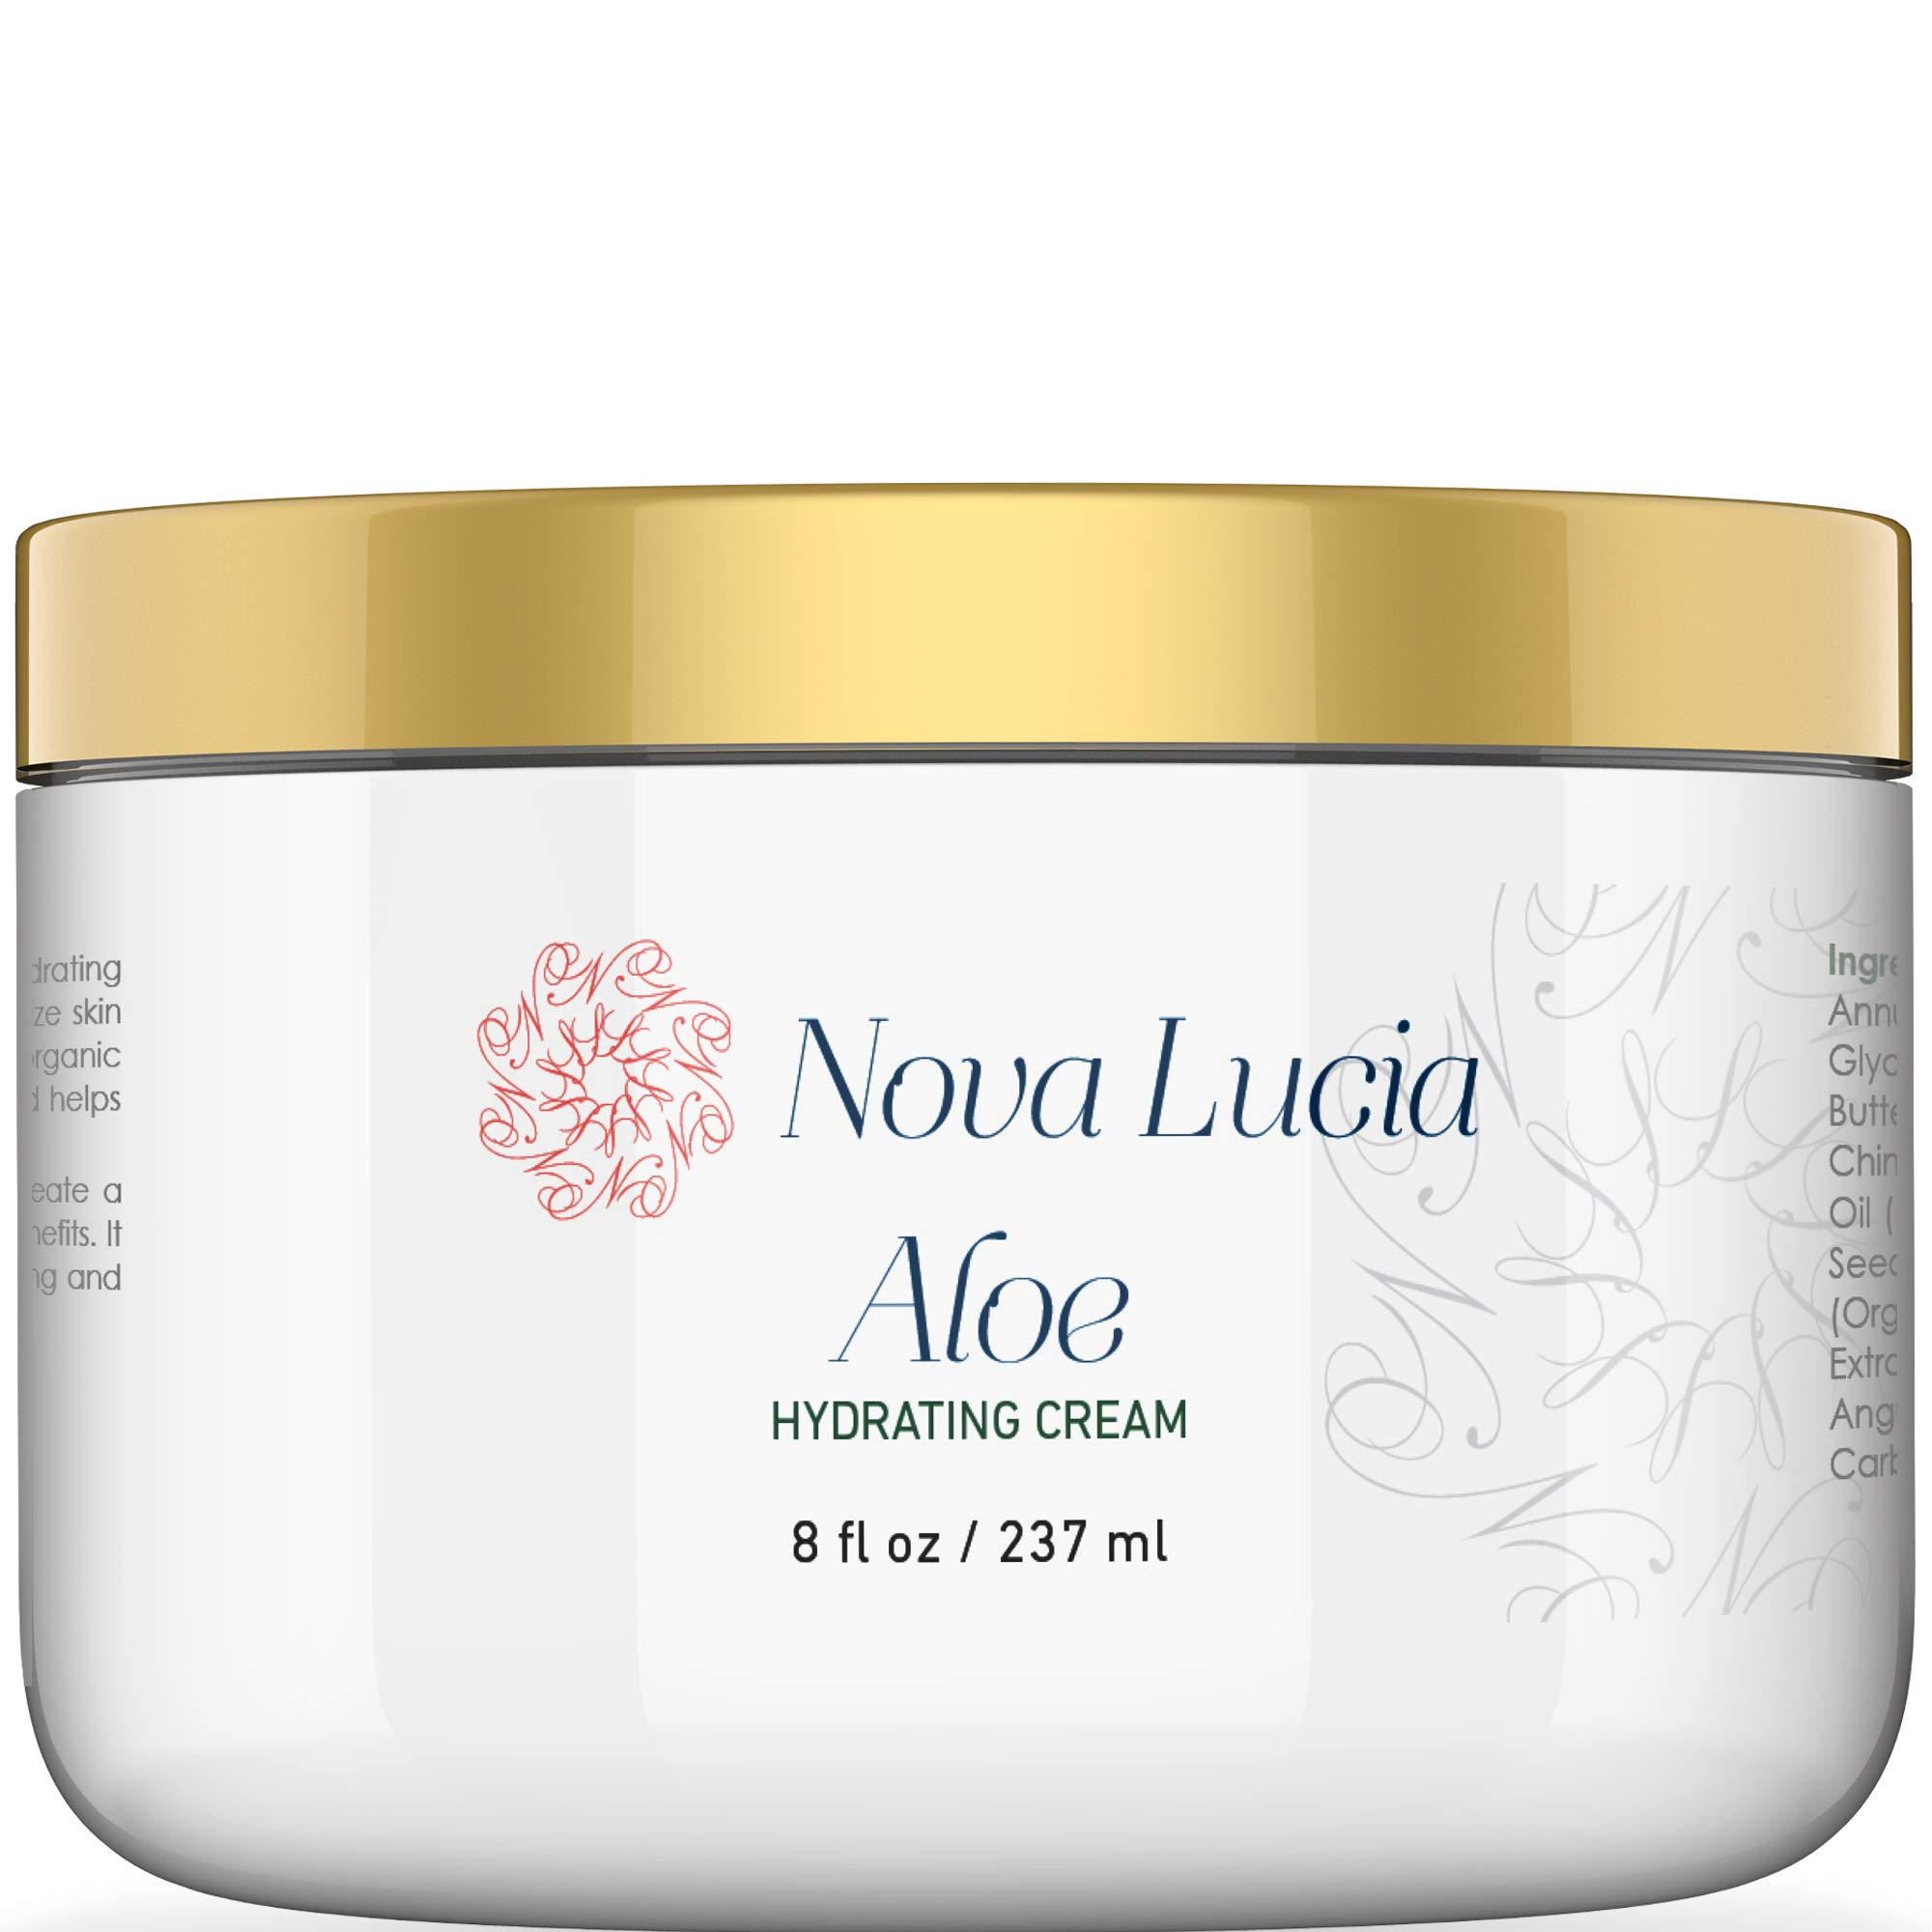 Hawaiian Aloe Vera Face Moisturizer Night Cream Sunburn Relief Face Cream Eczema Cream Lotion For Dry Skin & Wrinkle Cream For Women Compare With Aloe Vera Gel 100 Percent Pure Aloe Vera Juice 8 oz